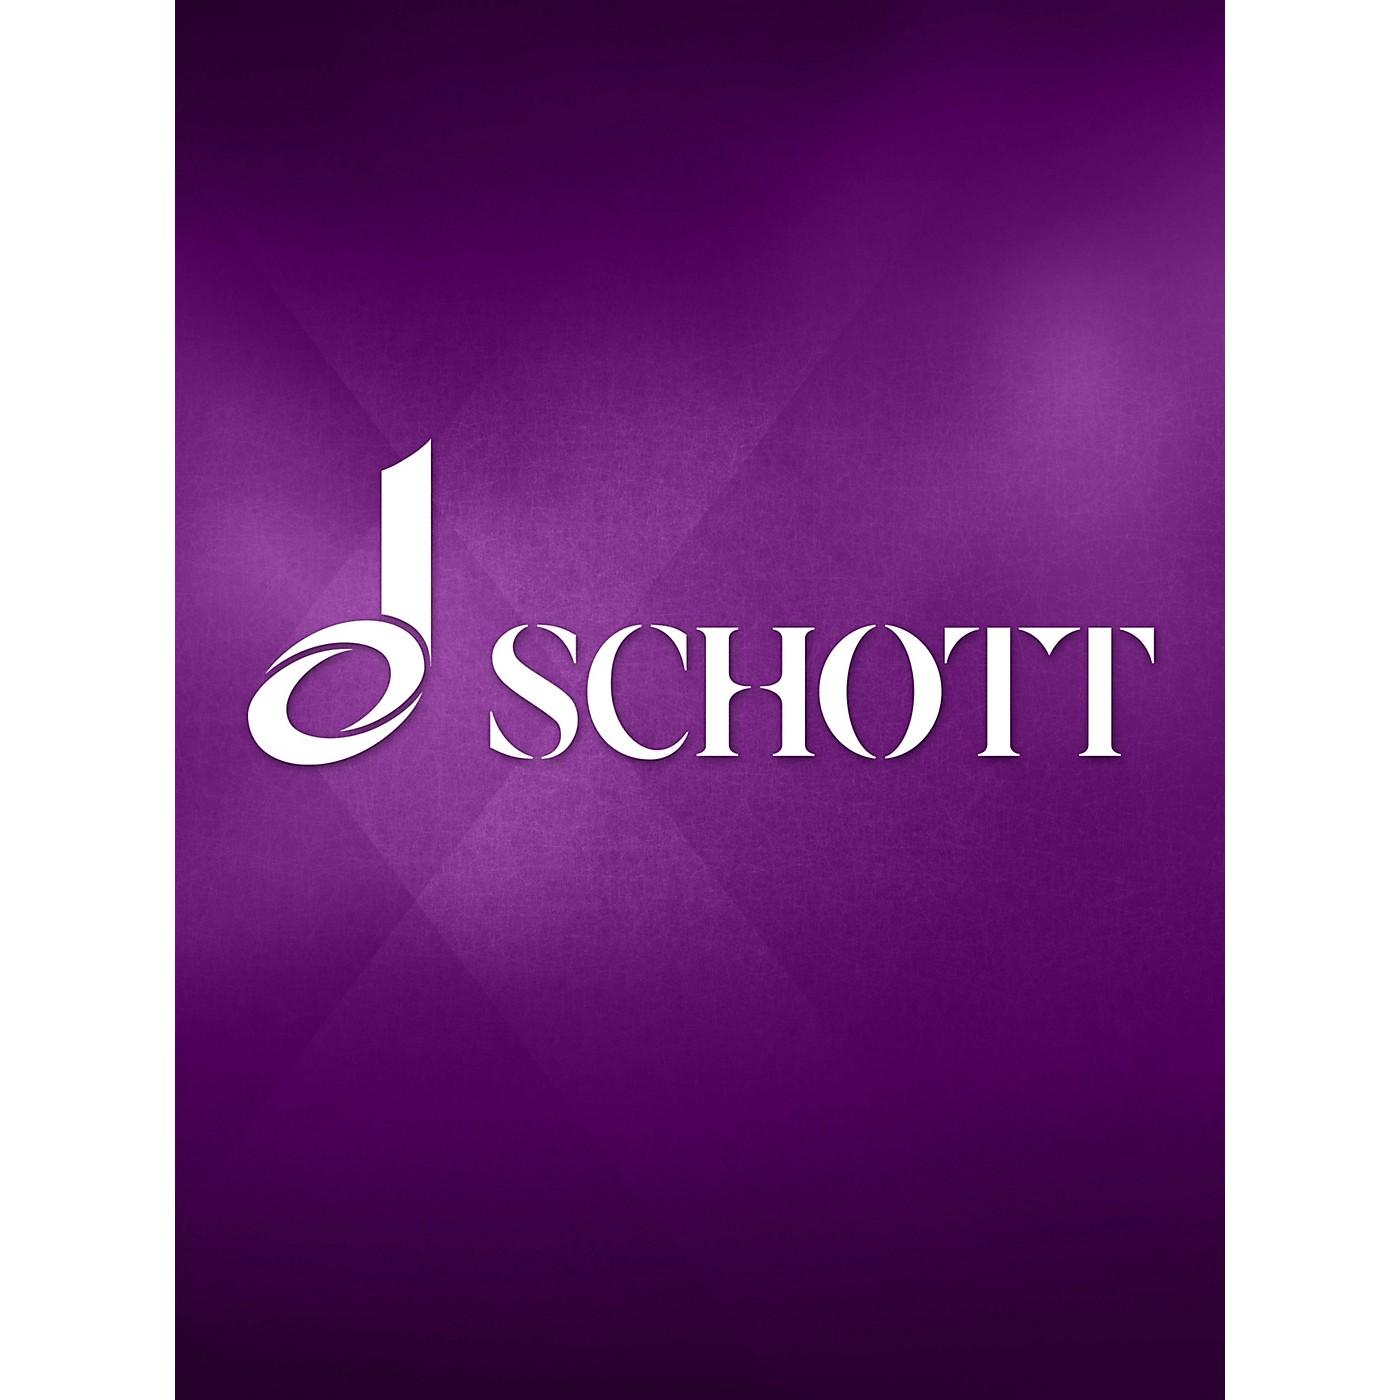 Schott Das Bild Richard Wagners (2 Volumes) (German Language) Schott Series thumbnail